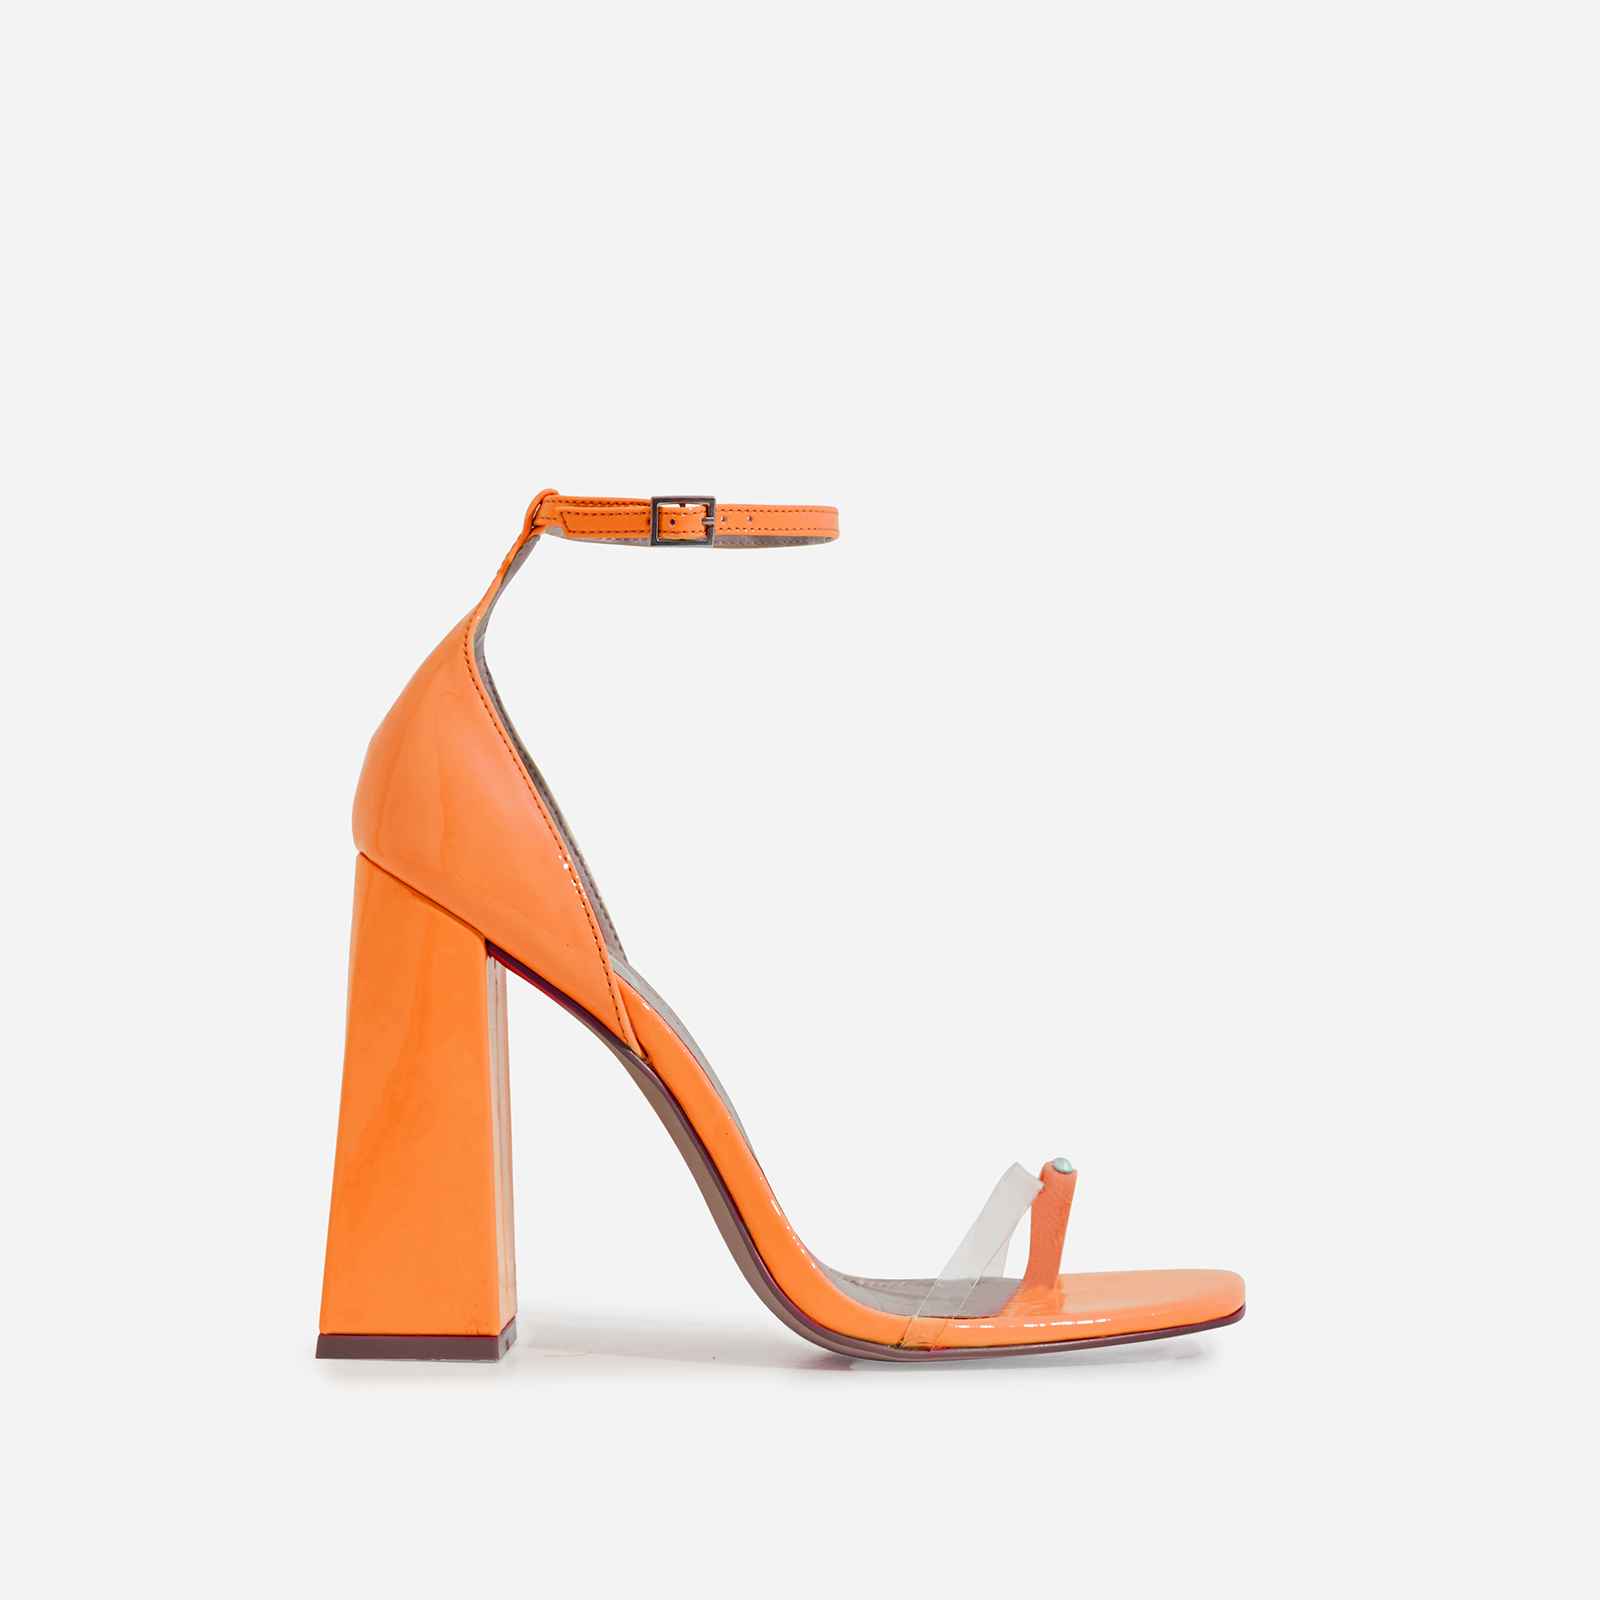 Perch Diamante Detail Strap Square Toe Perspex Flared Block Heel In Orange Patent